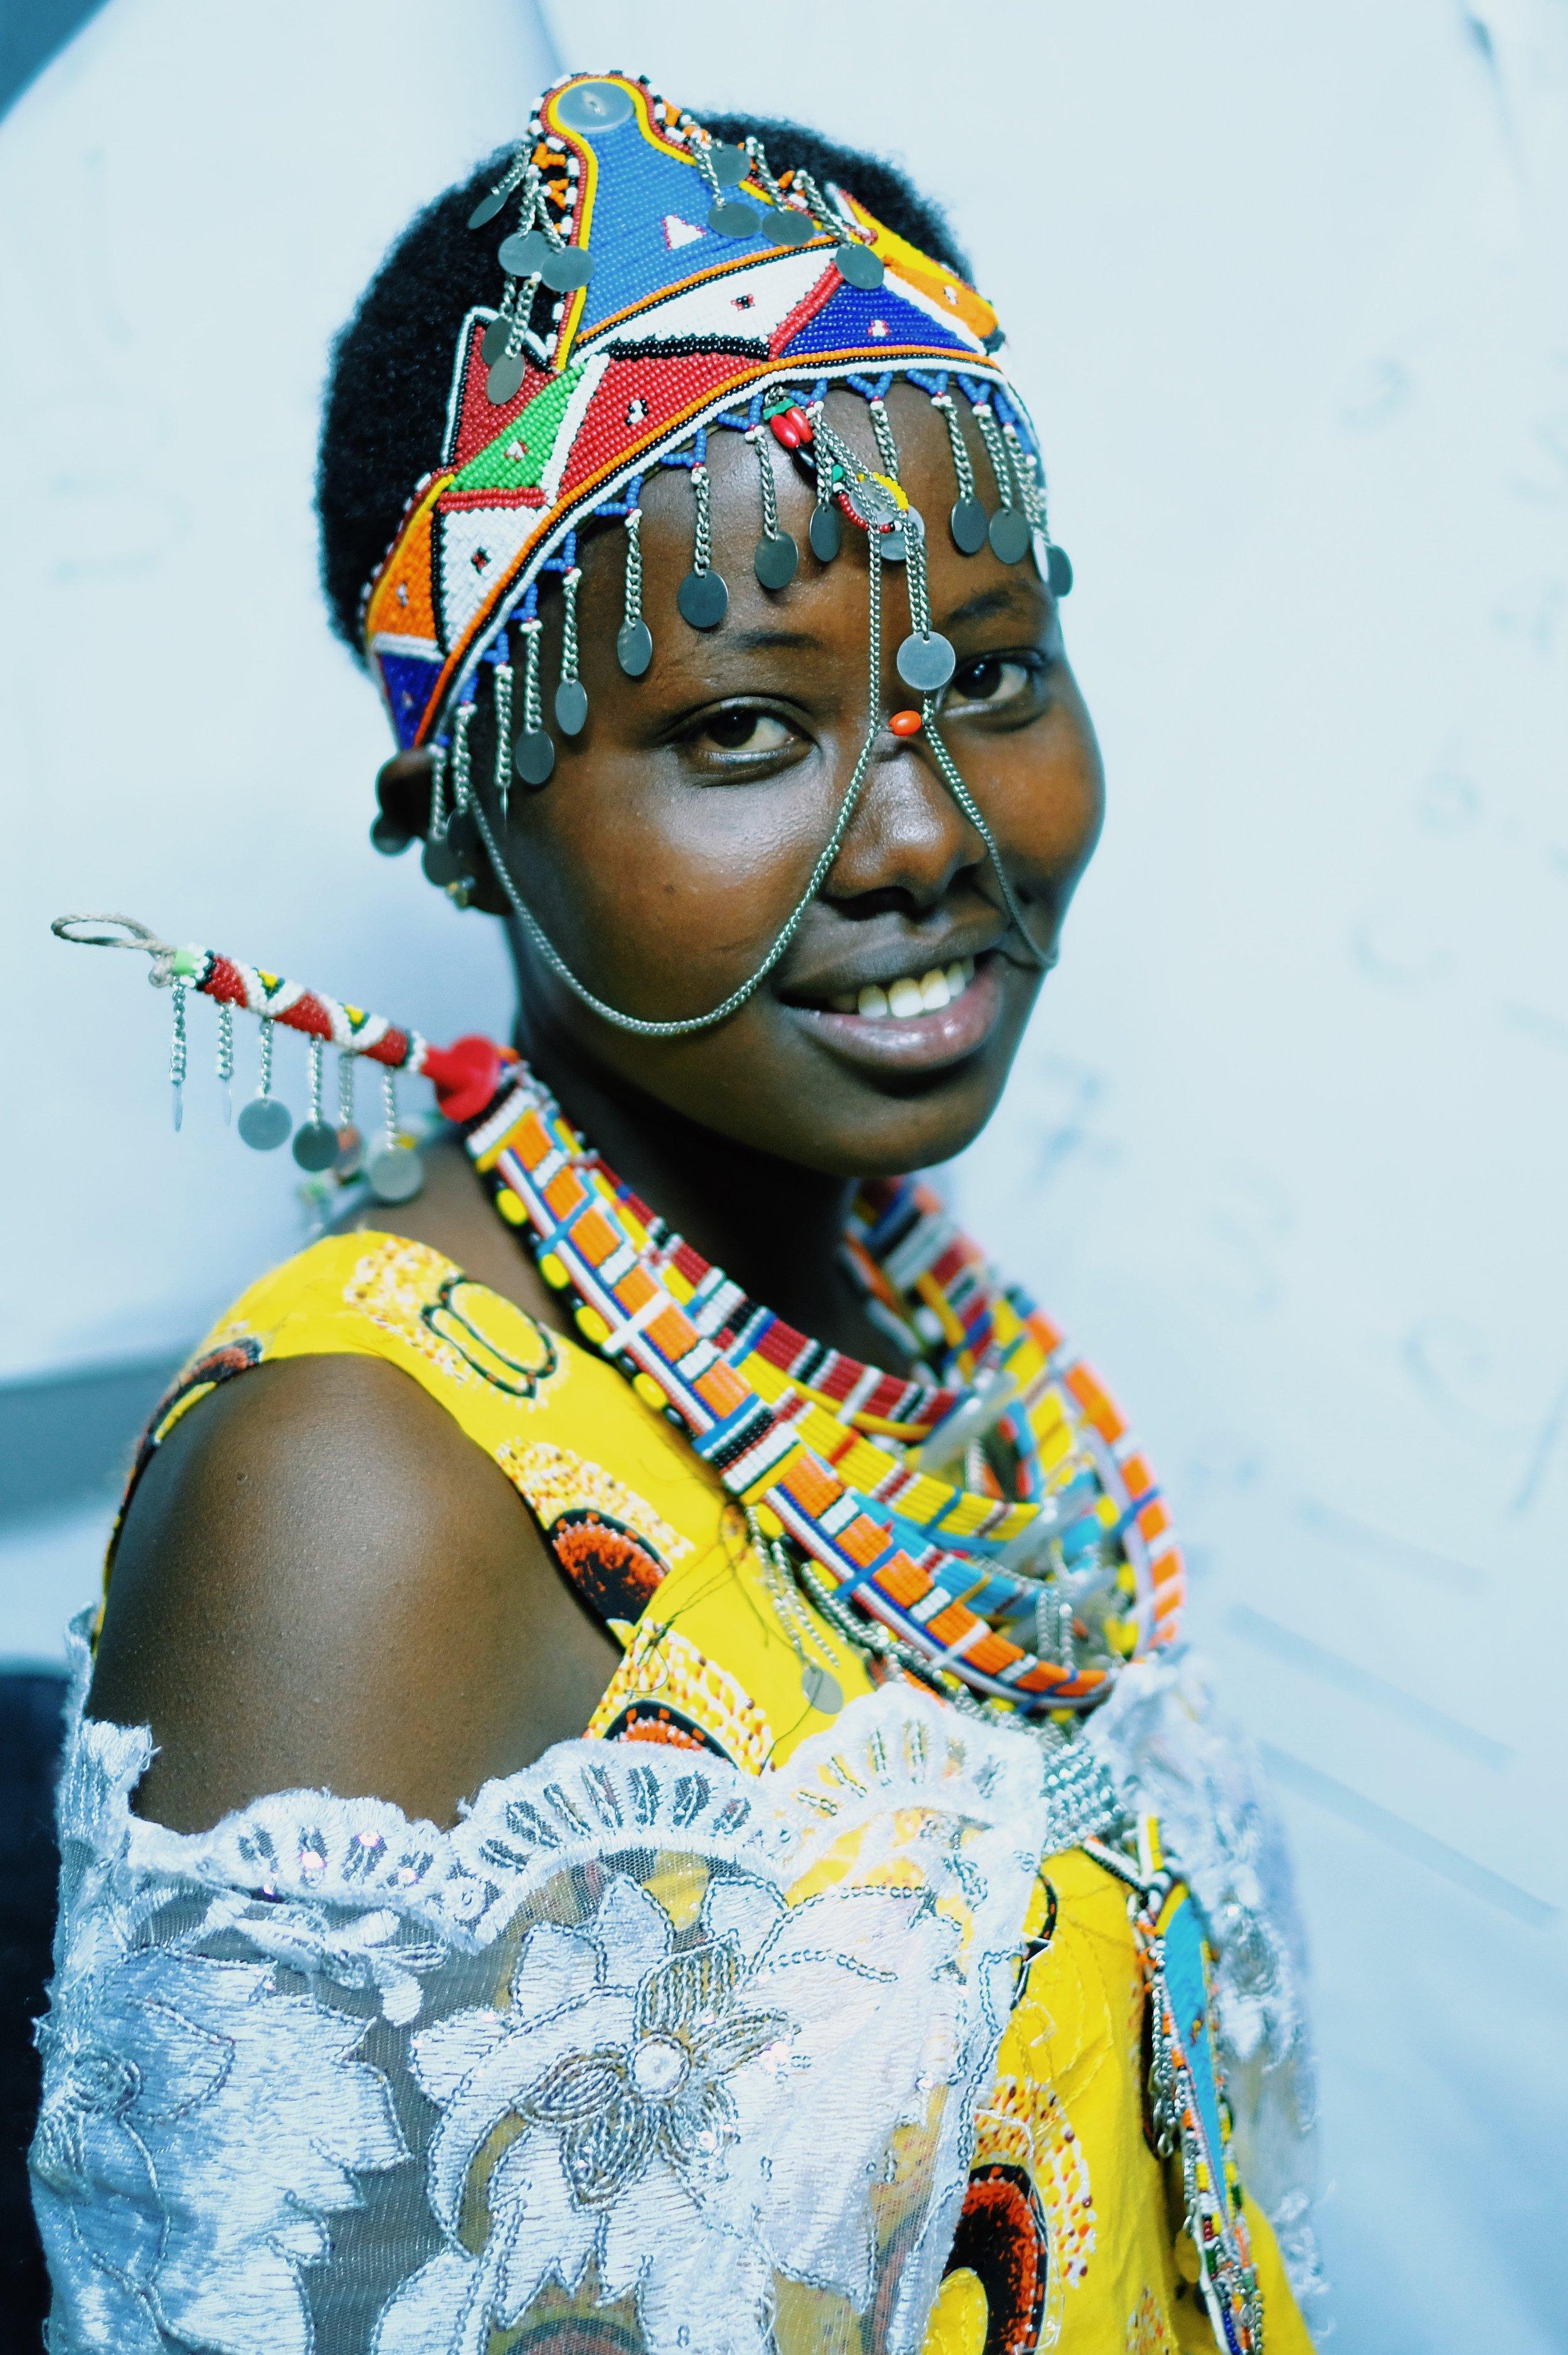 Maasai Olentoko 'End FGM' Beauty Pageant 1 by Joost Bastmeijer.jpeg